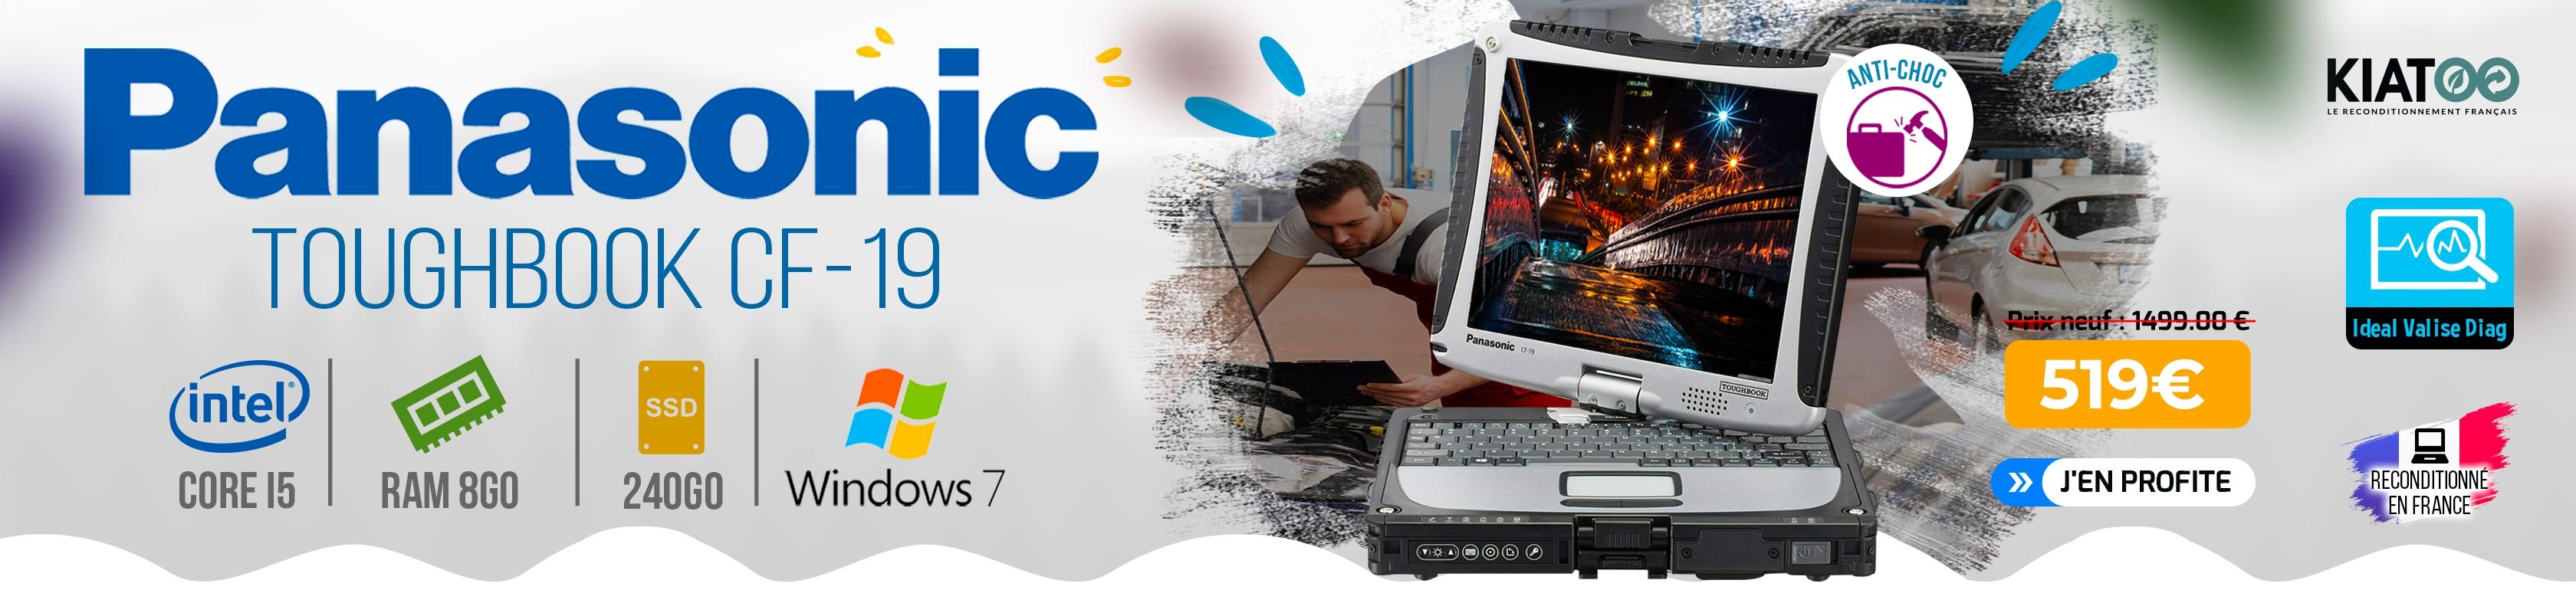 Panasonic ToughBook CF 19 i5 8Go RAM 240Go SSD Windows 7